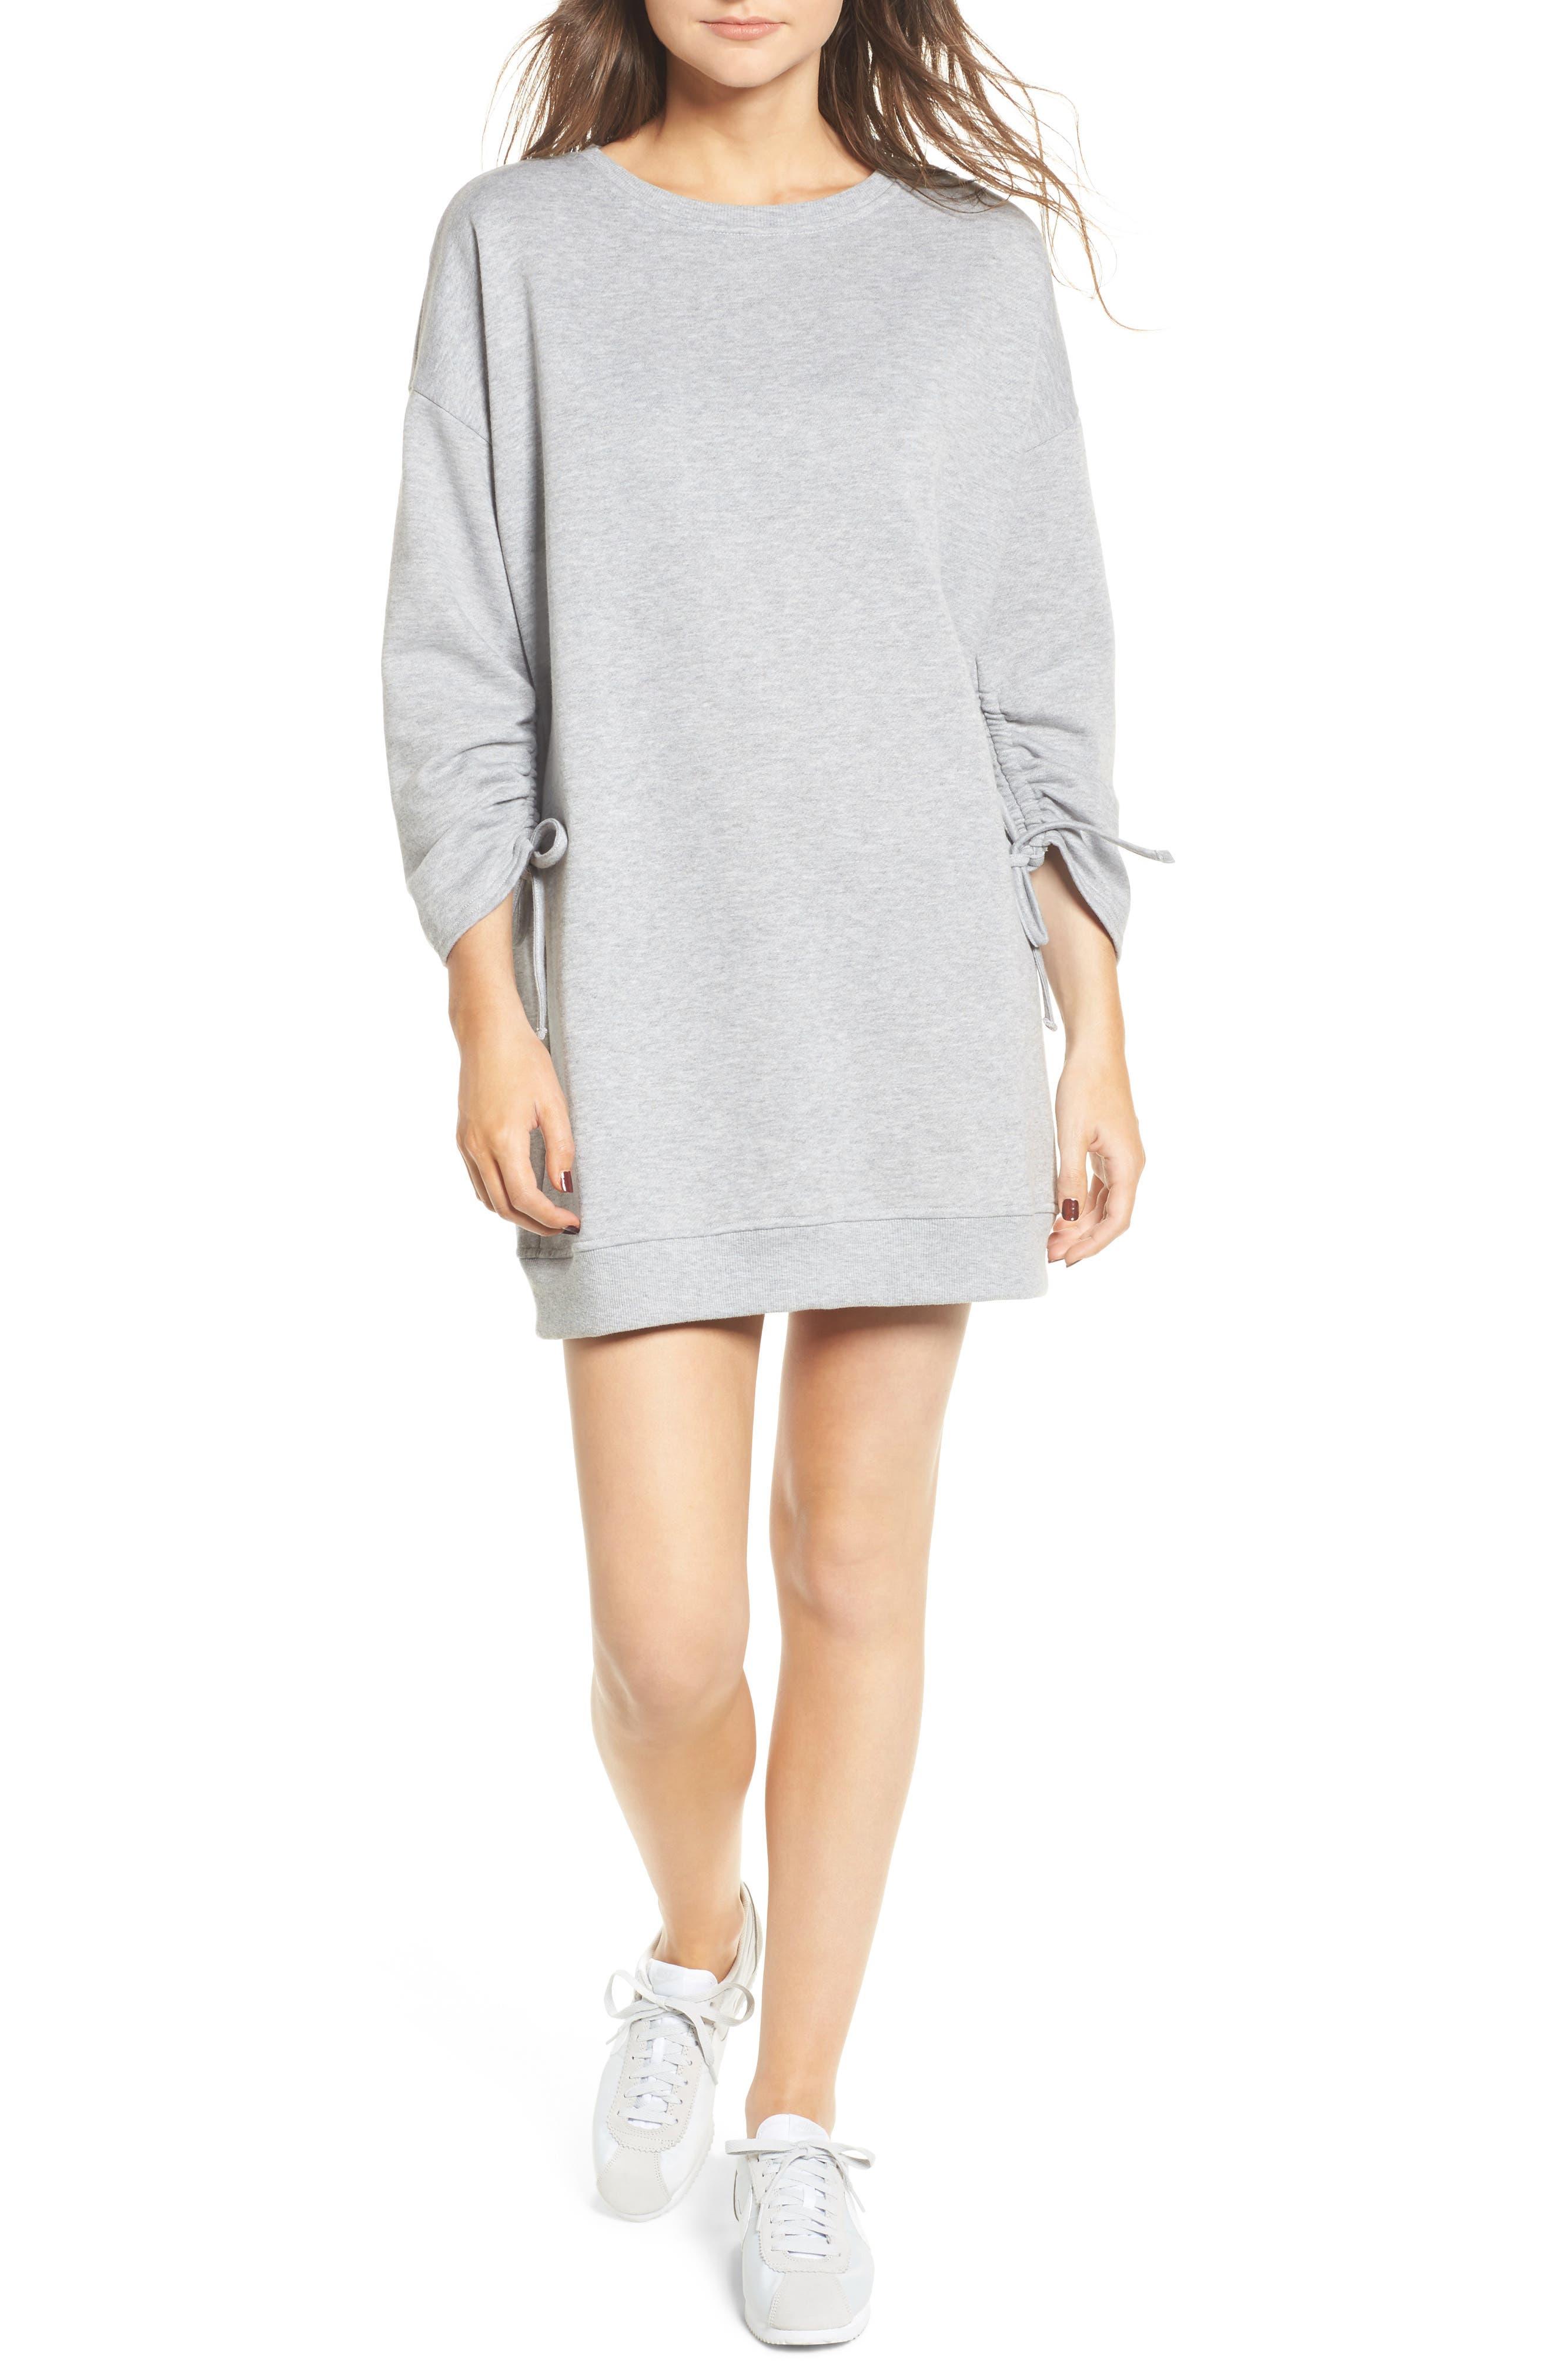 Ruched Sleeve Sweatshirt Dress,                             Main thumbnail 1, color,                             020